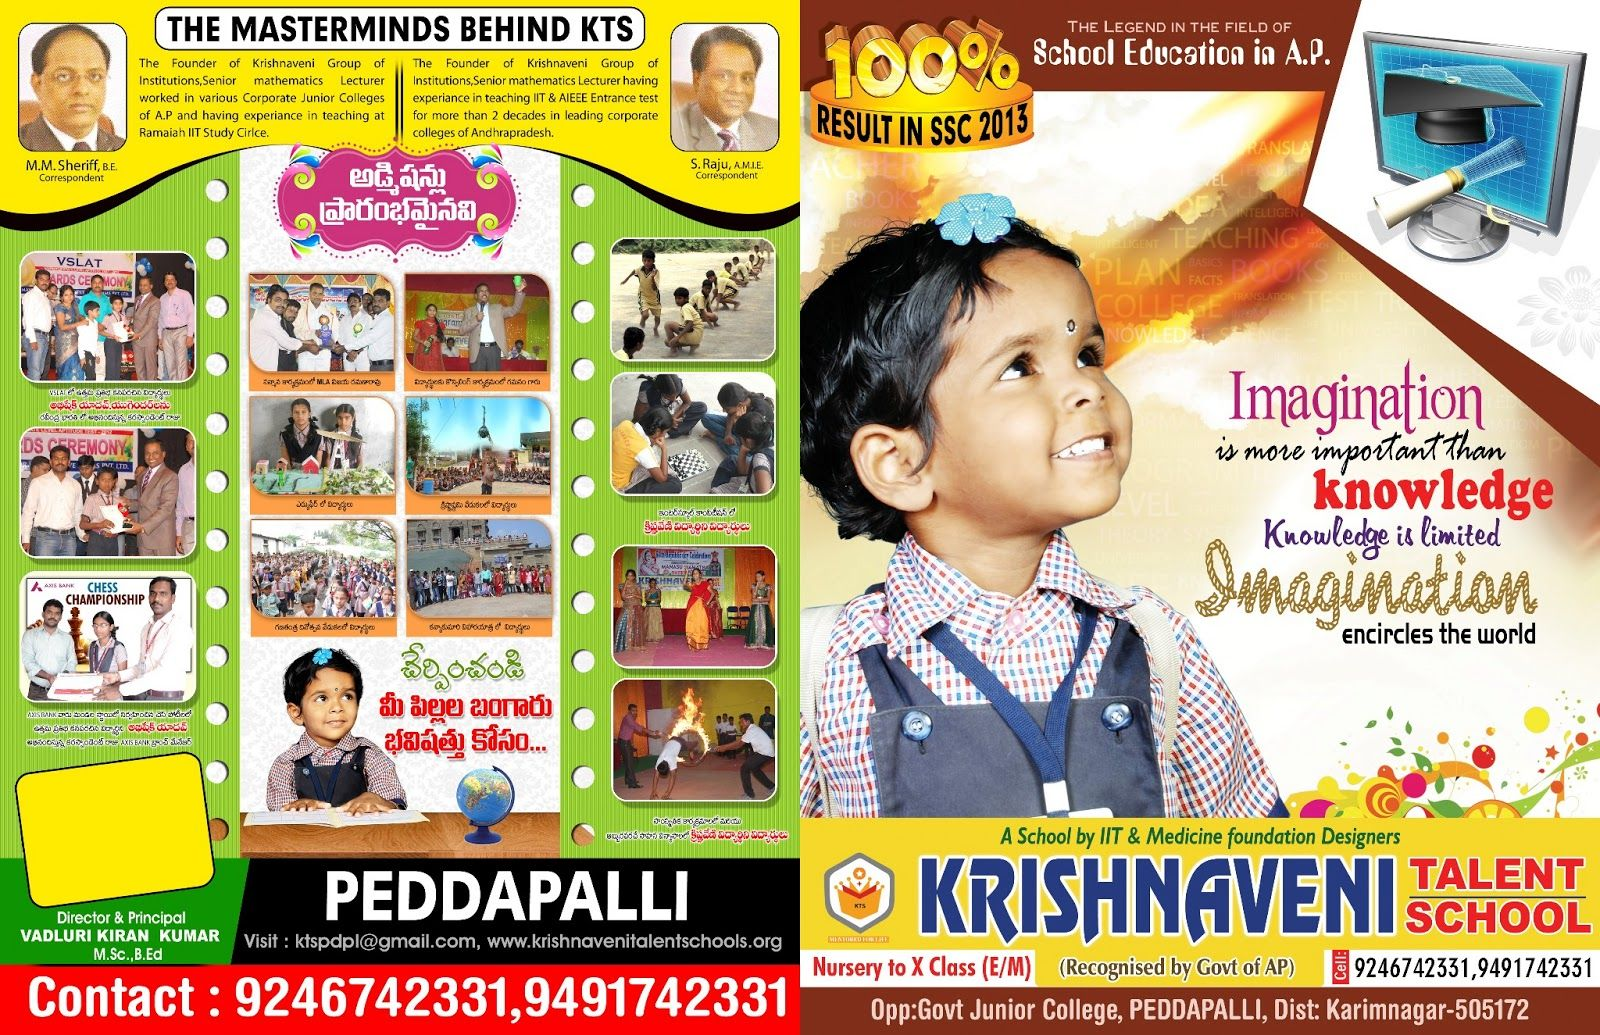 Krishnaveni Talent School Custom Brochure Design Template Free